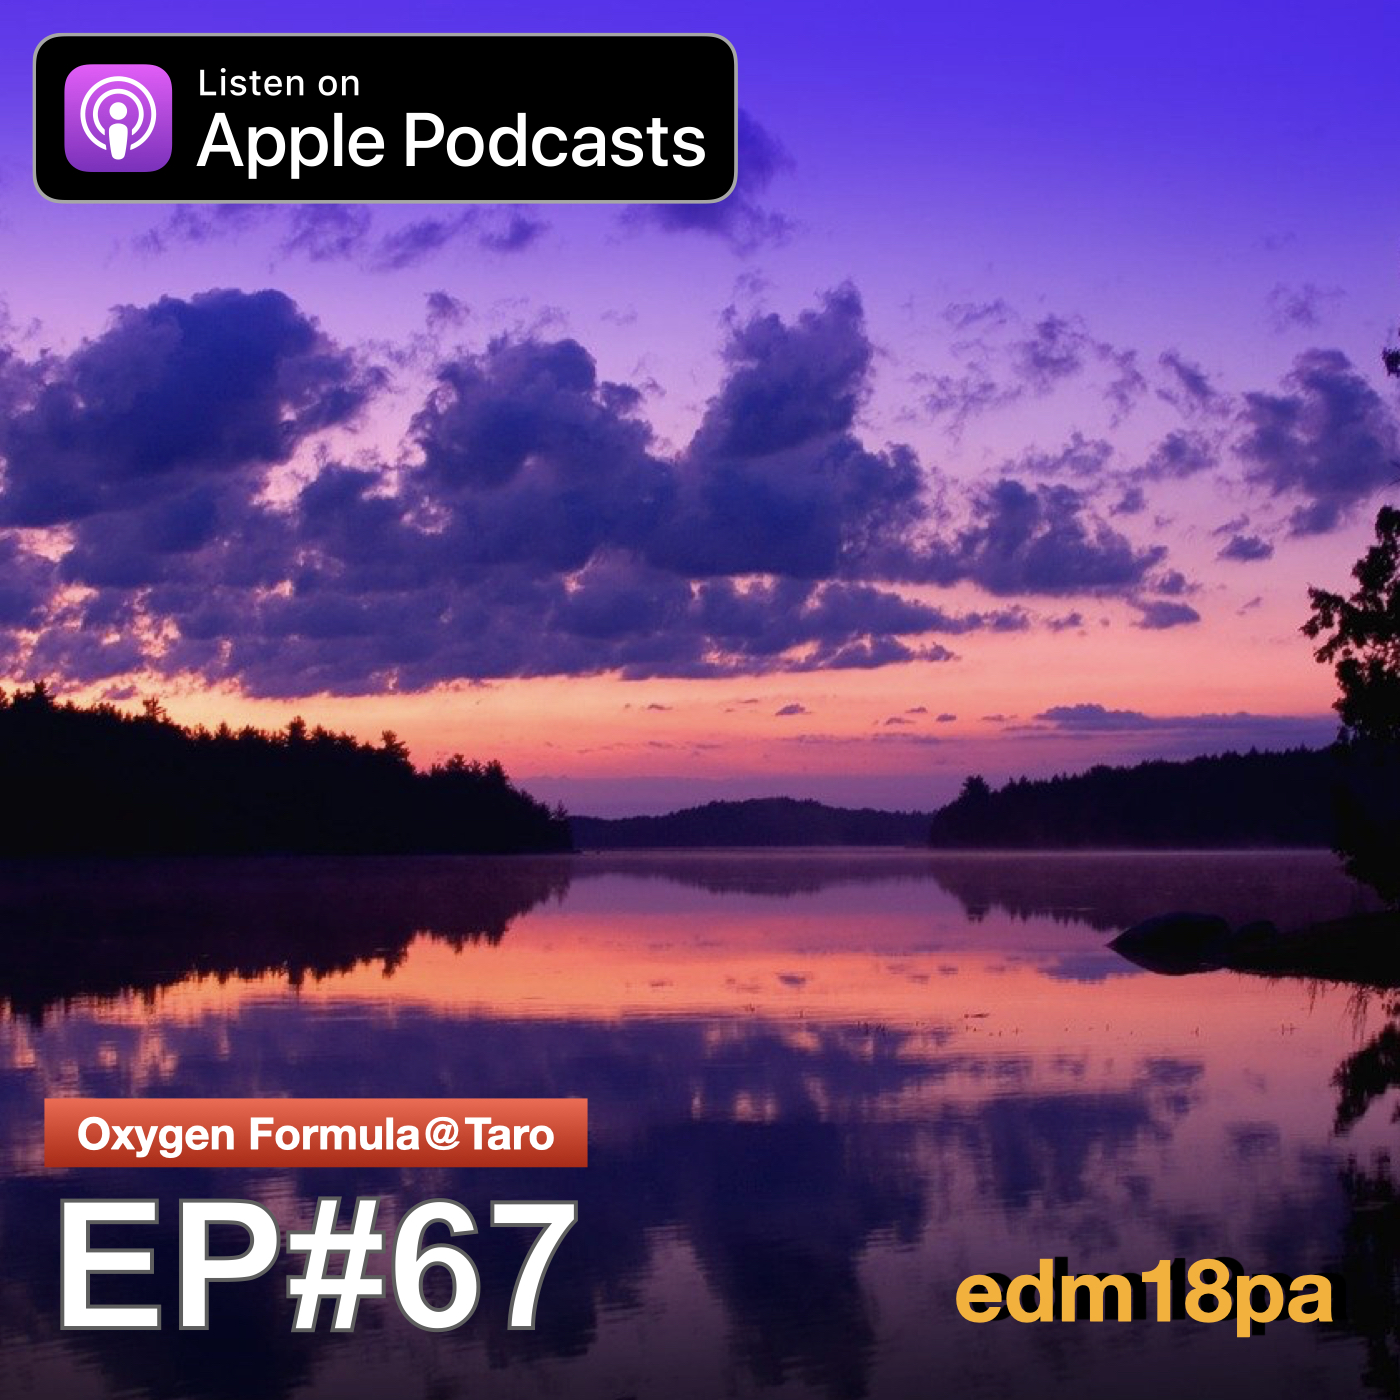 EP67 | Calm /Positive - 週末涼夏輕電音『守護家園&保衛台灣(二十二)』